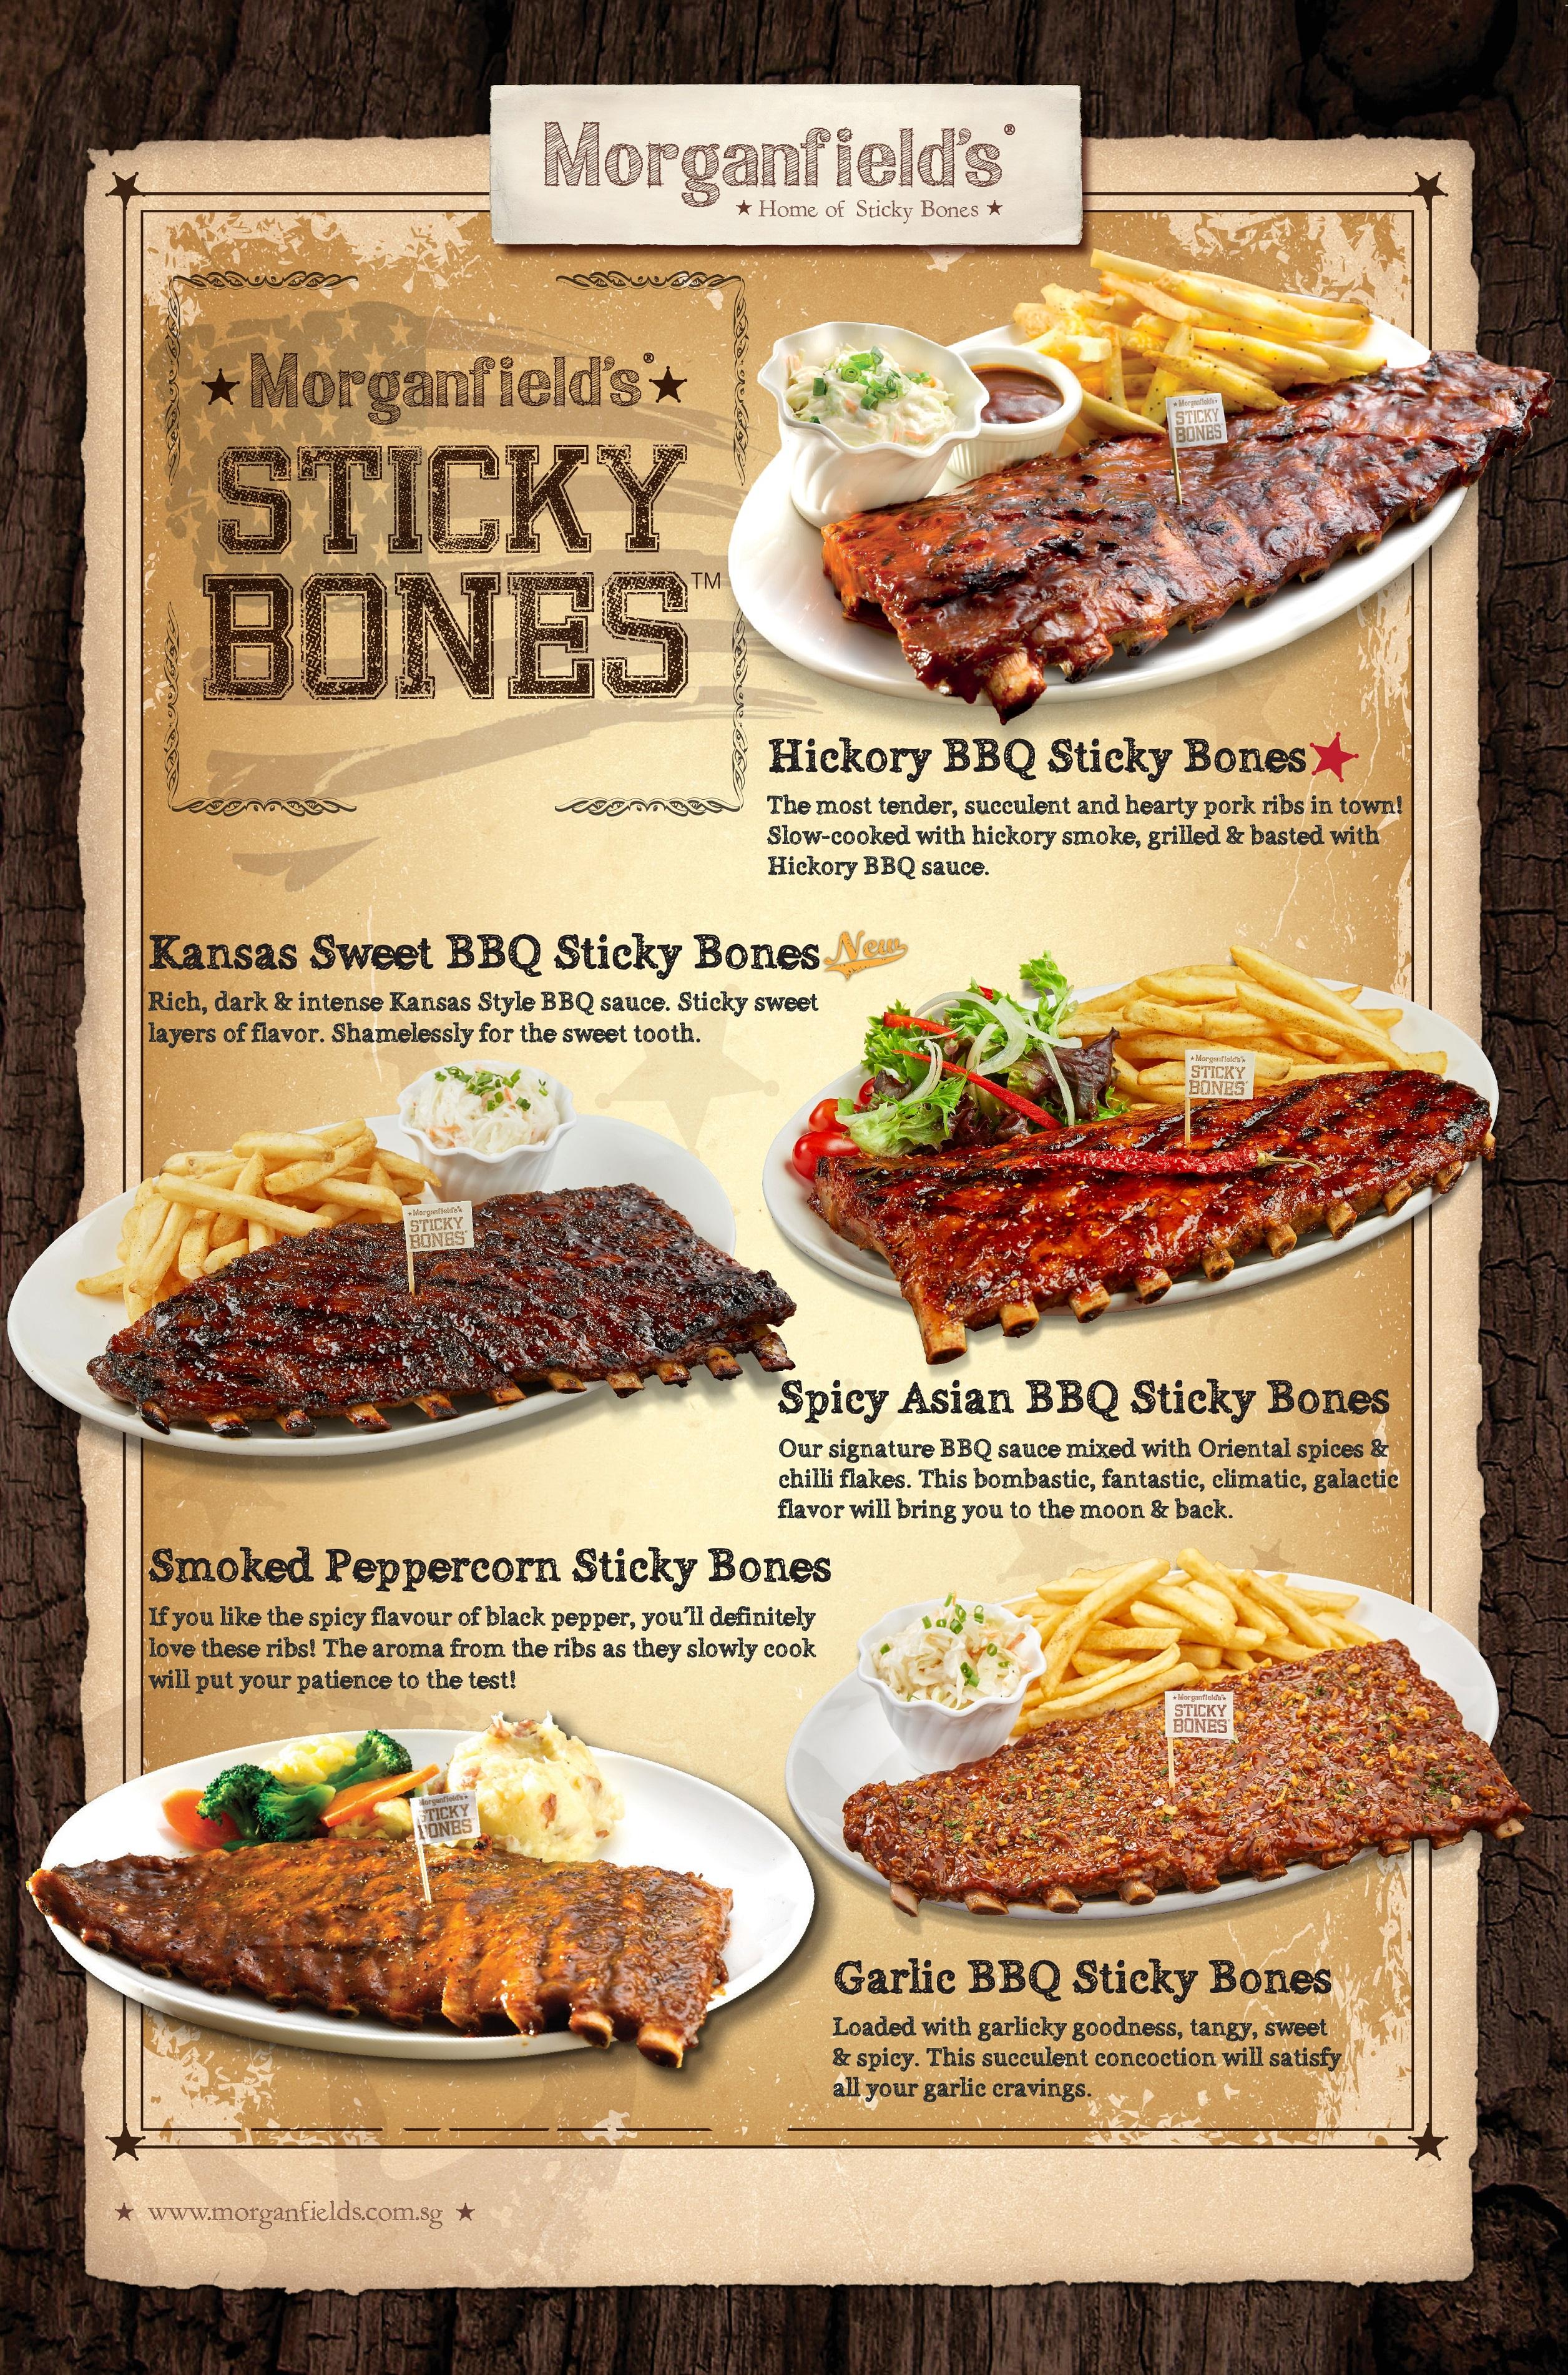 Morganfields SG Sticky Bones Poster (Nov 2017)